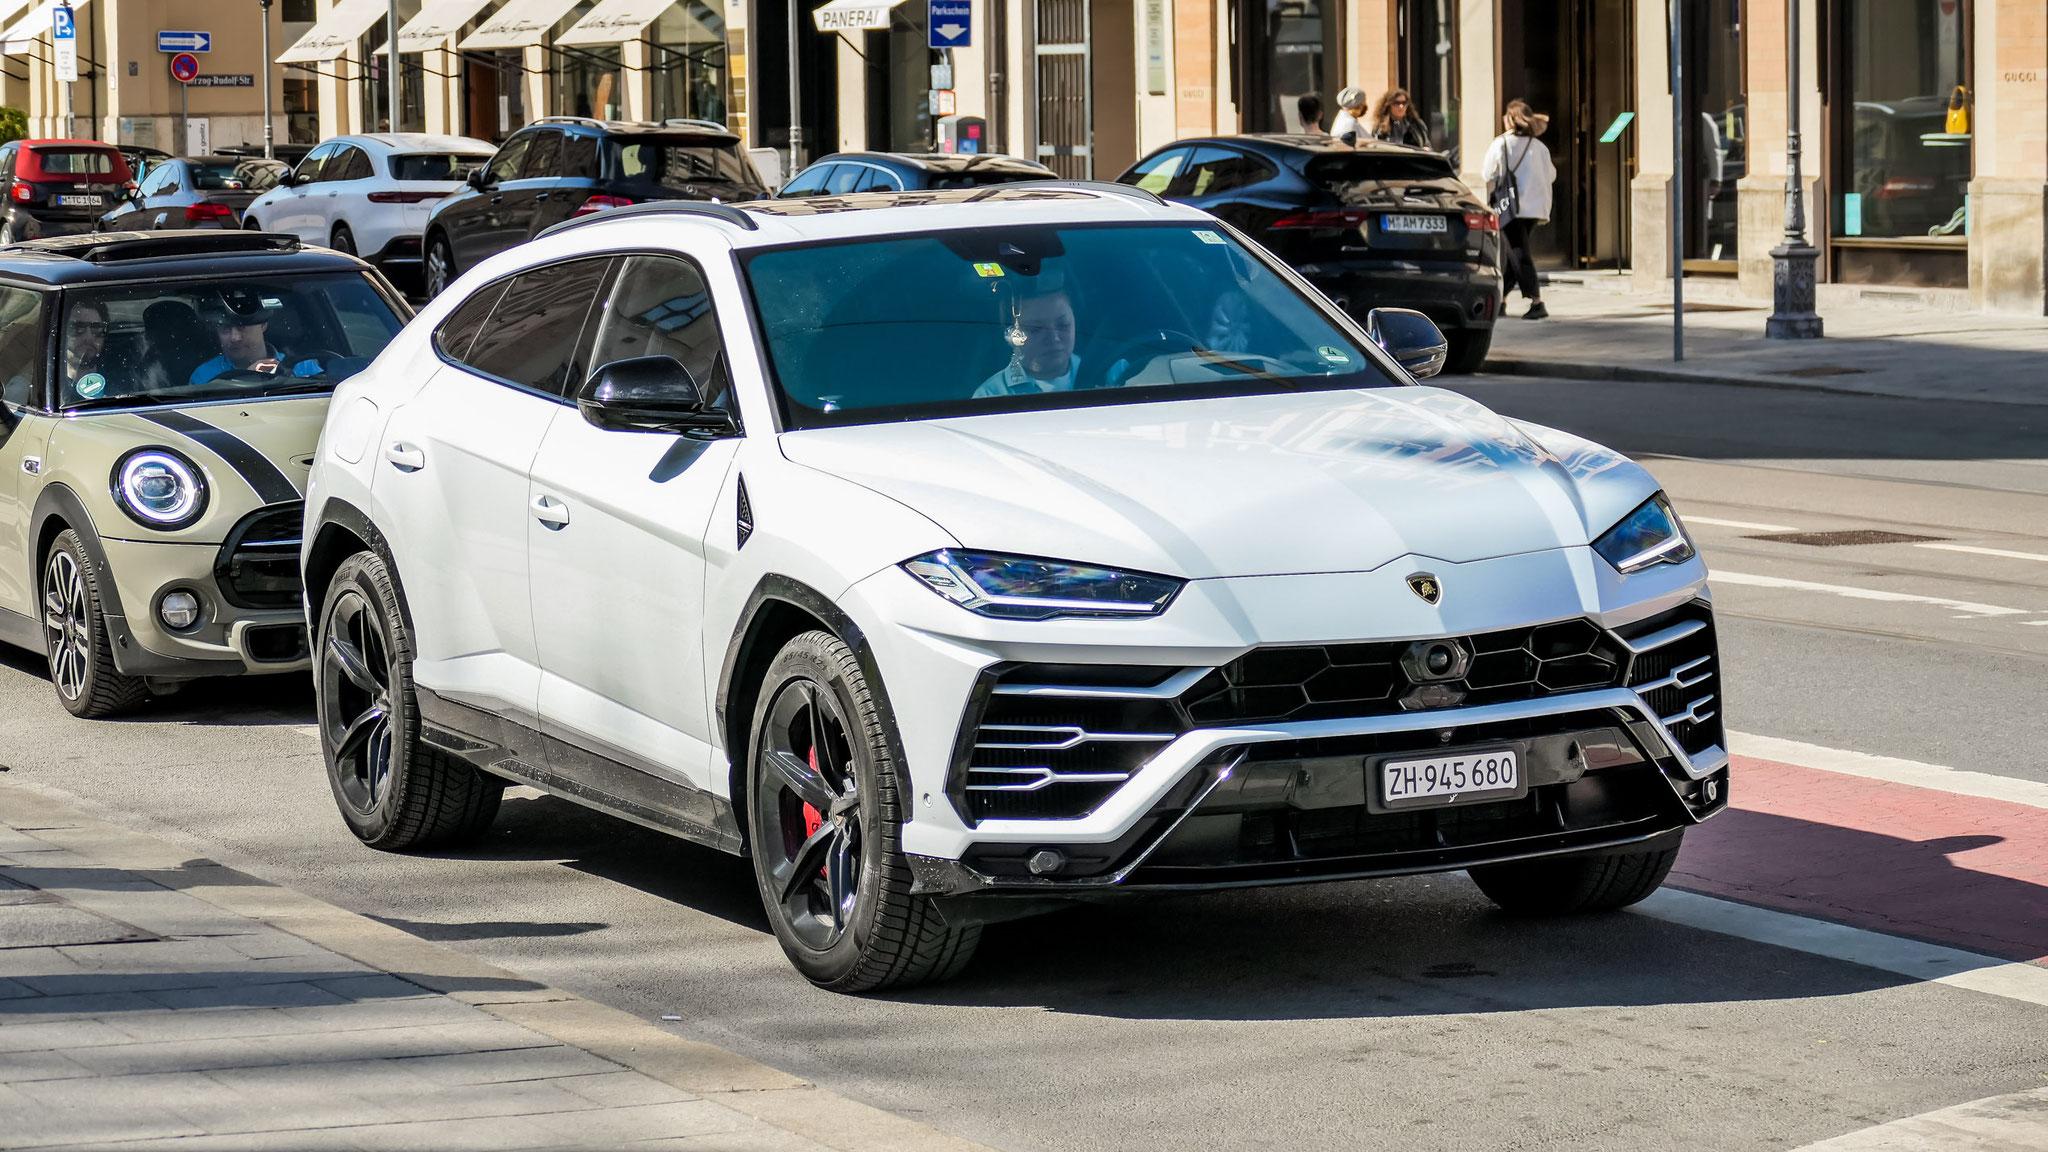 Lamborghini Urus - ZH-945680 (CH)